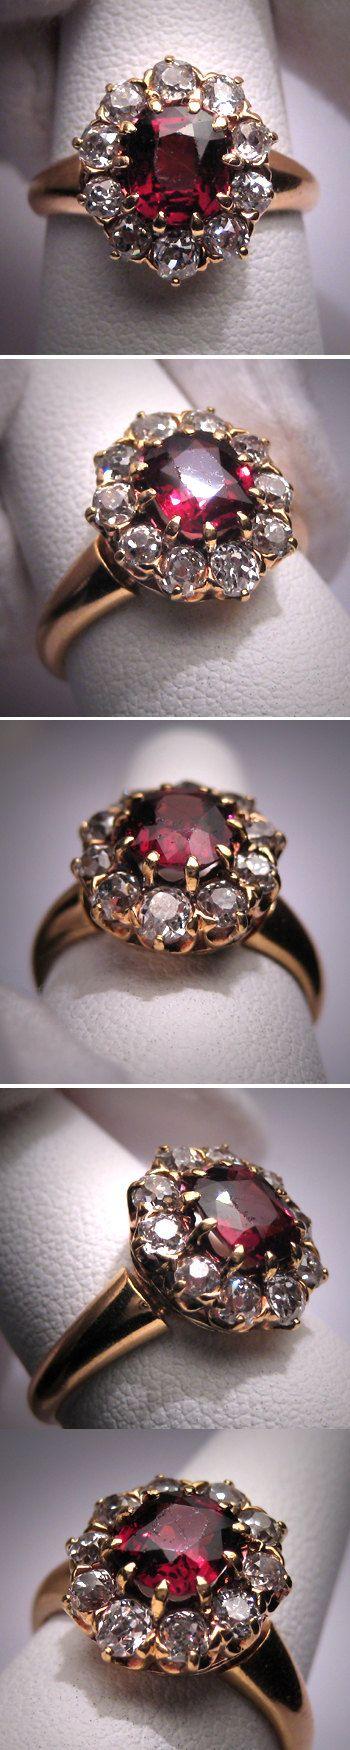 Antique Garnet Diamond Wedding Ring Vintage by AawsombleiJewelry, $2450.00